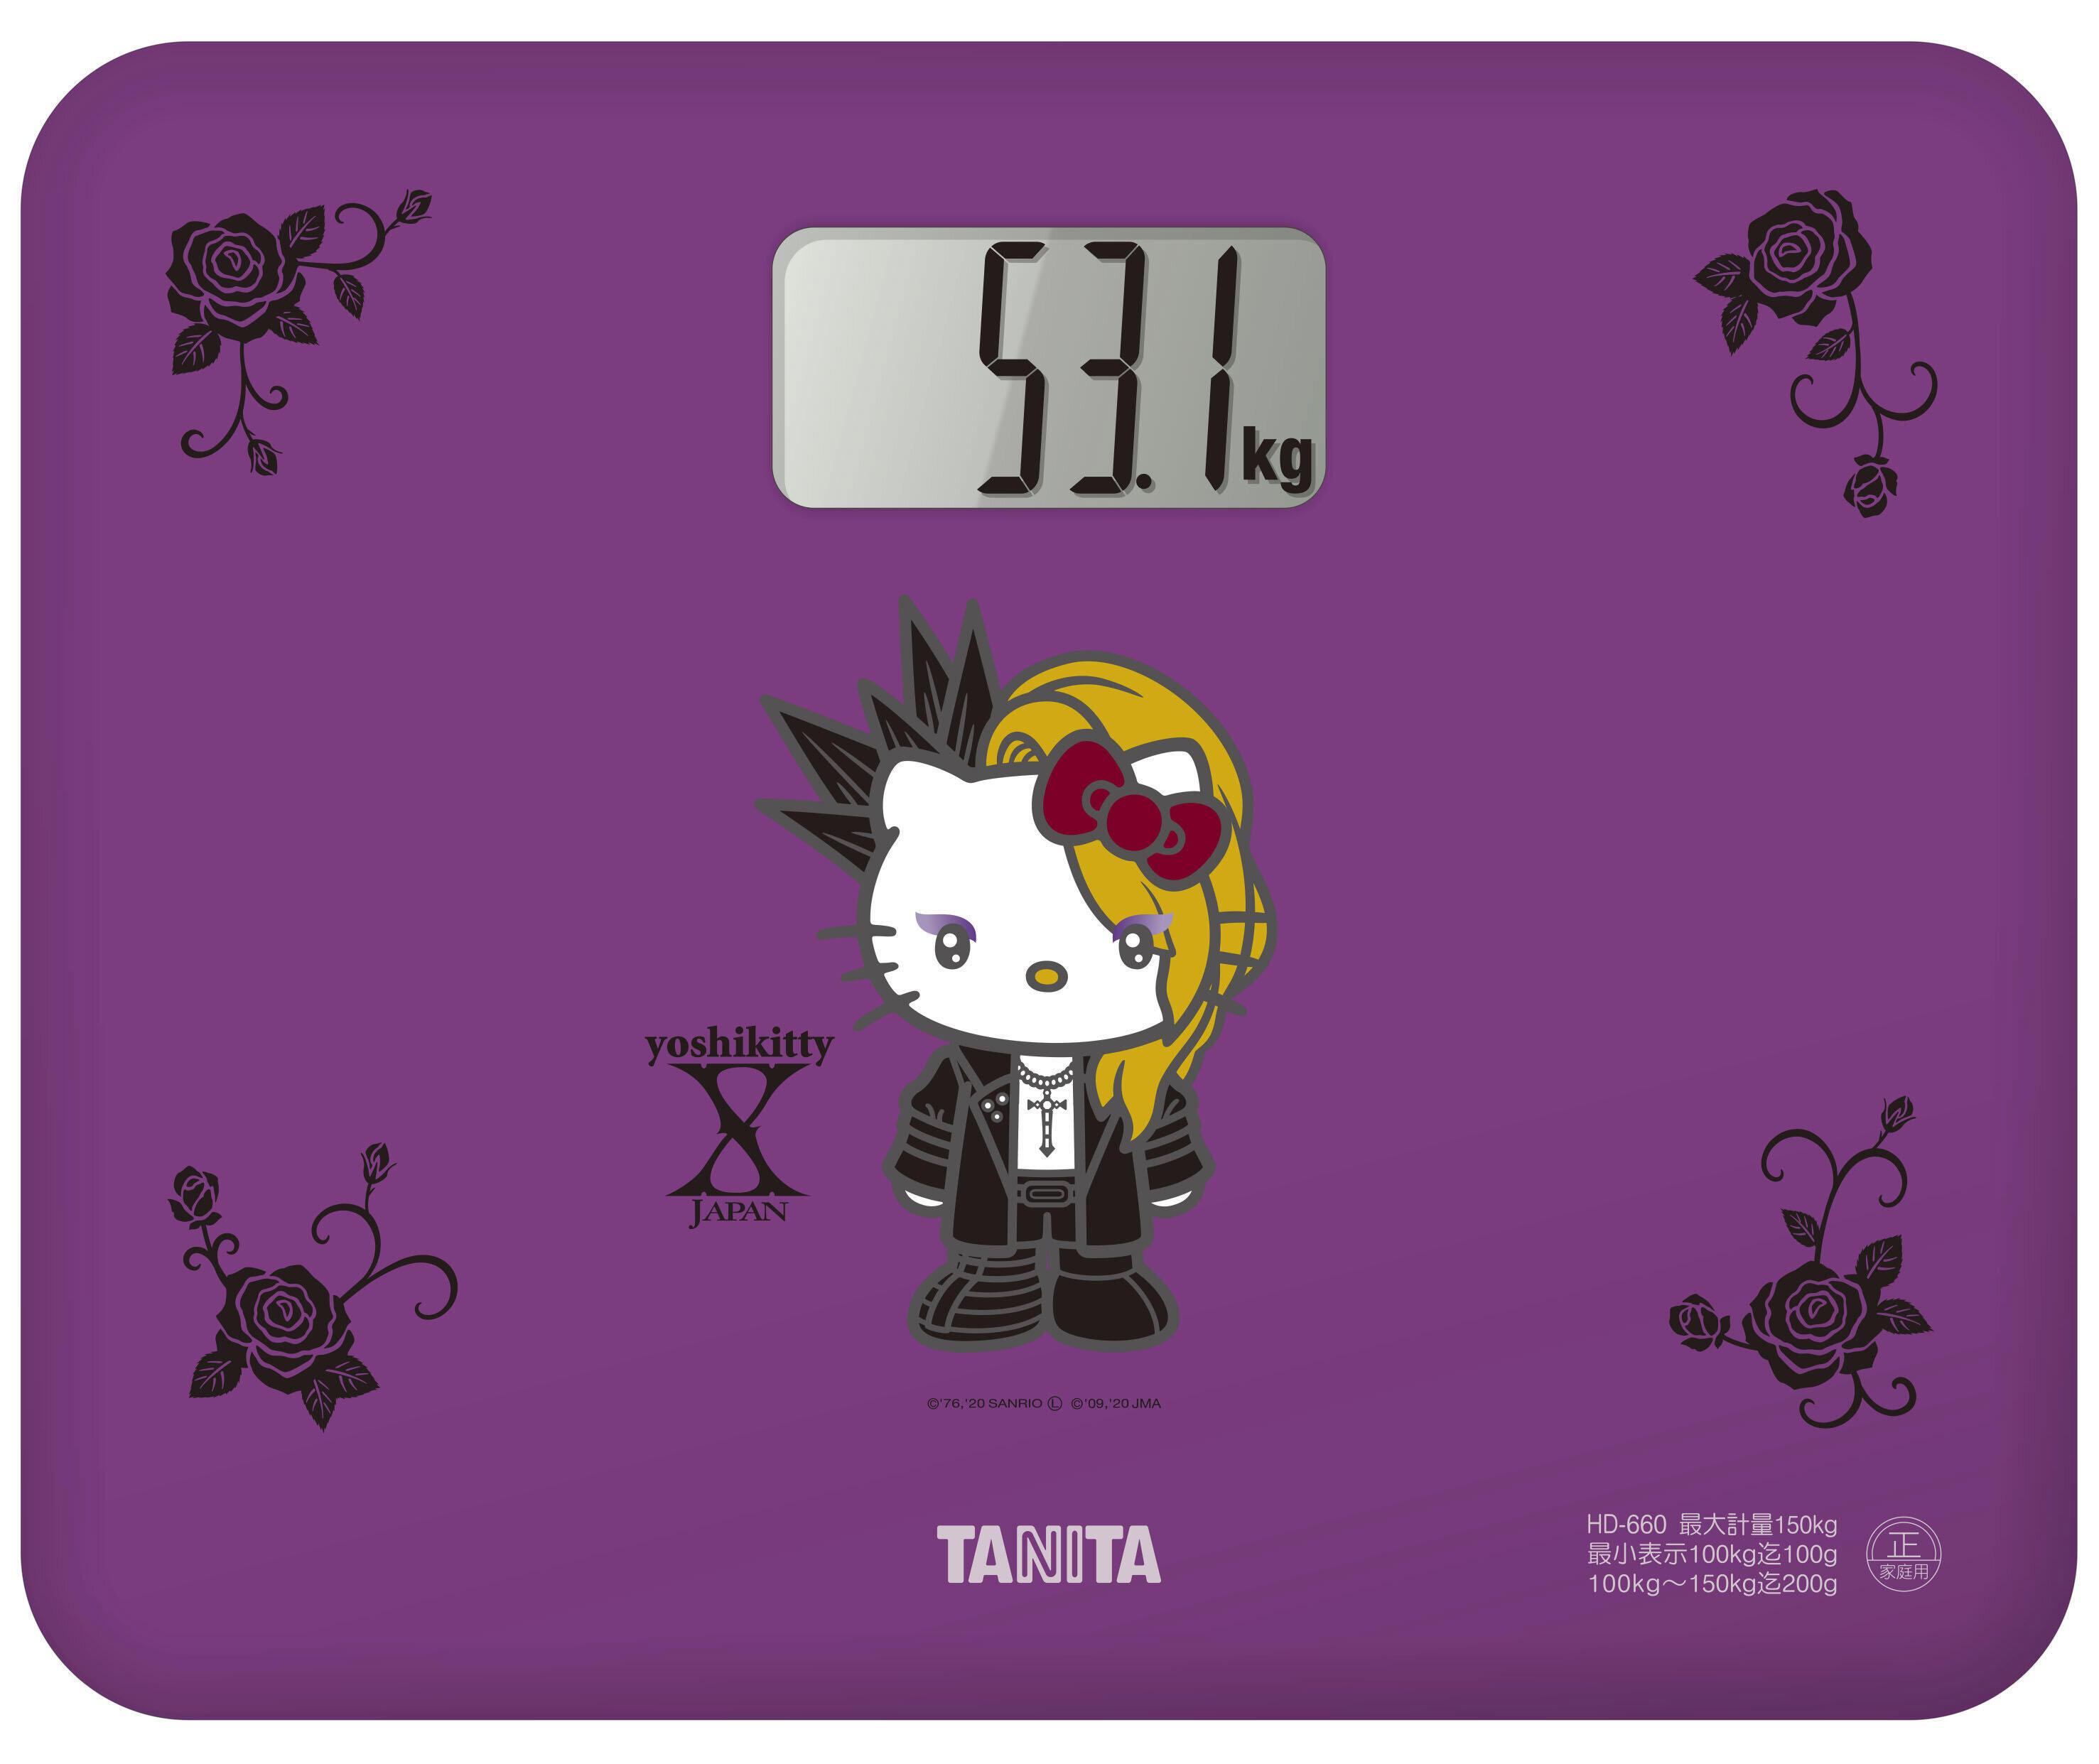 「X JAPAN」YOSHIKIとハローキティがコラボ 「yoshikitty」体重計